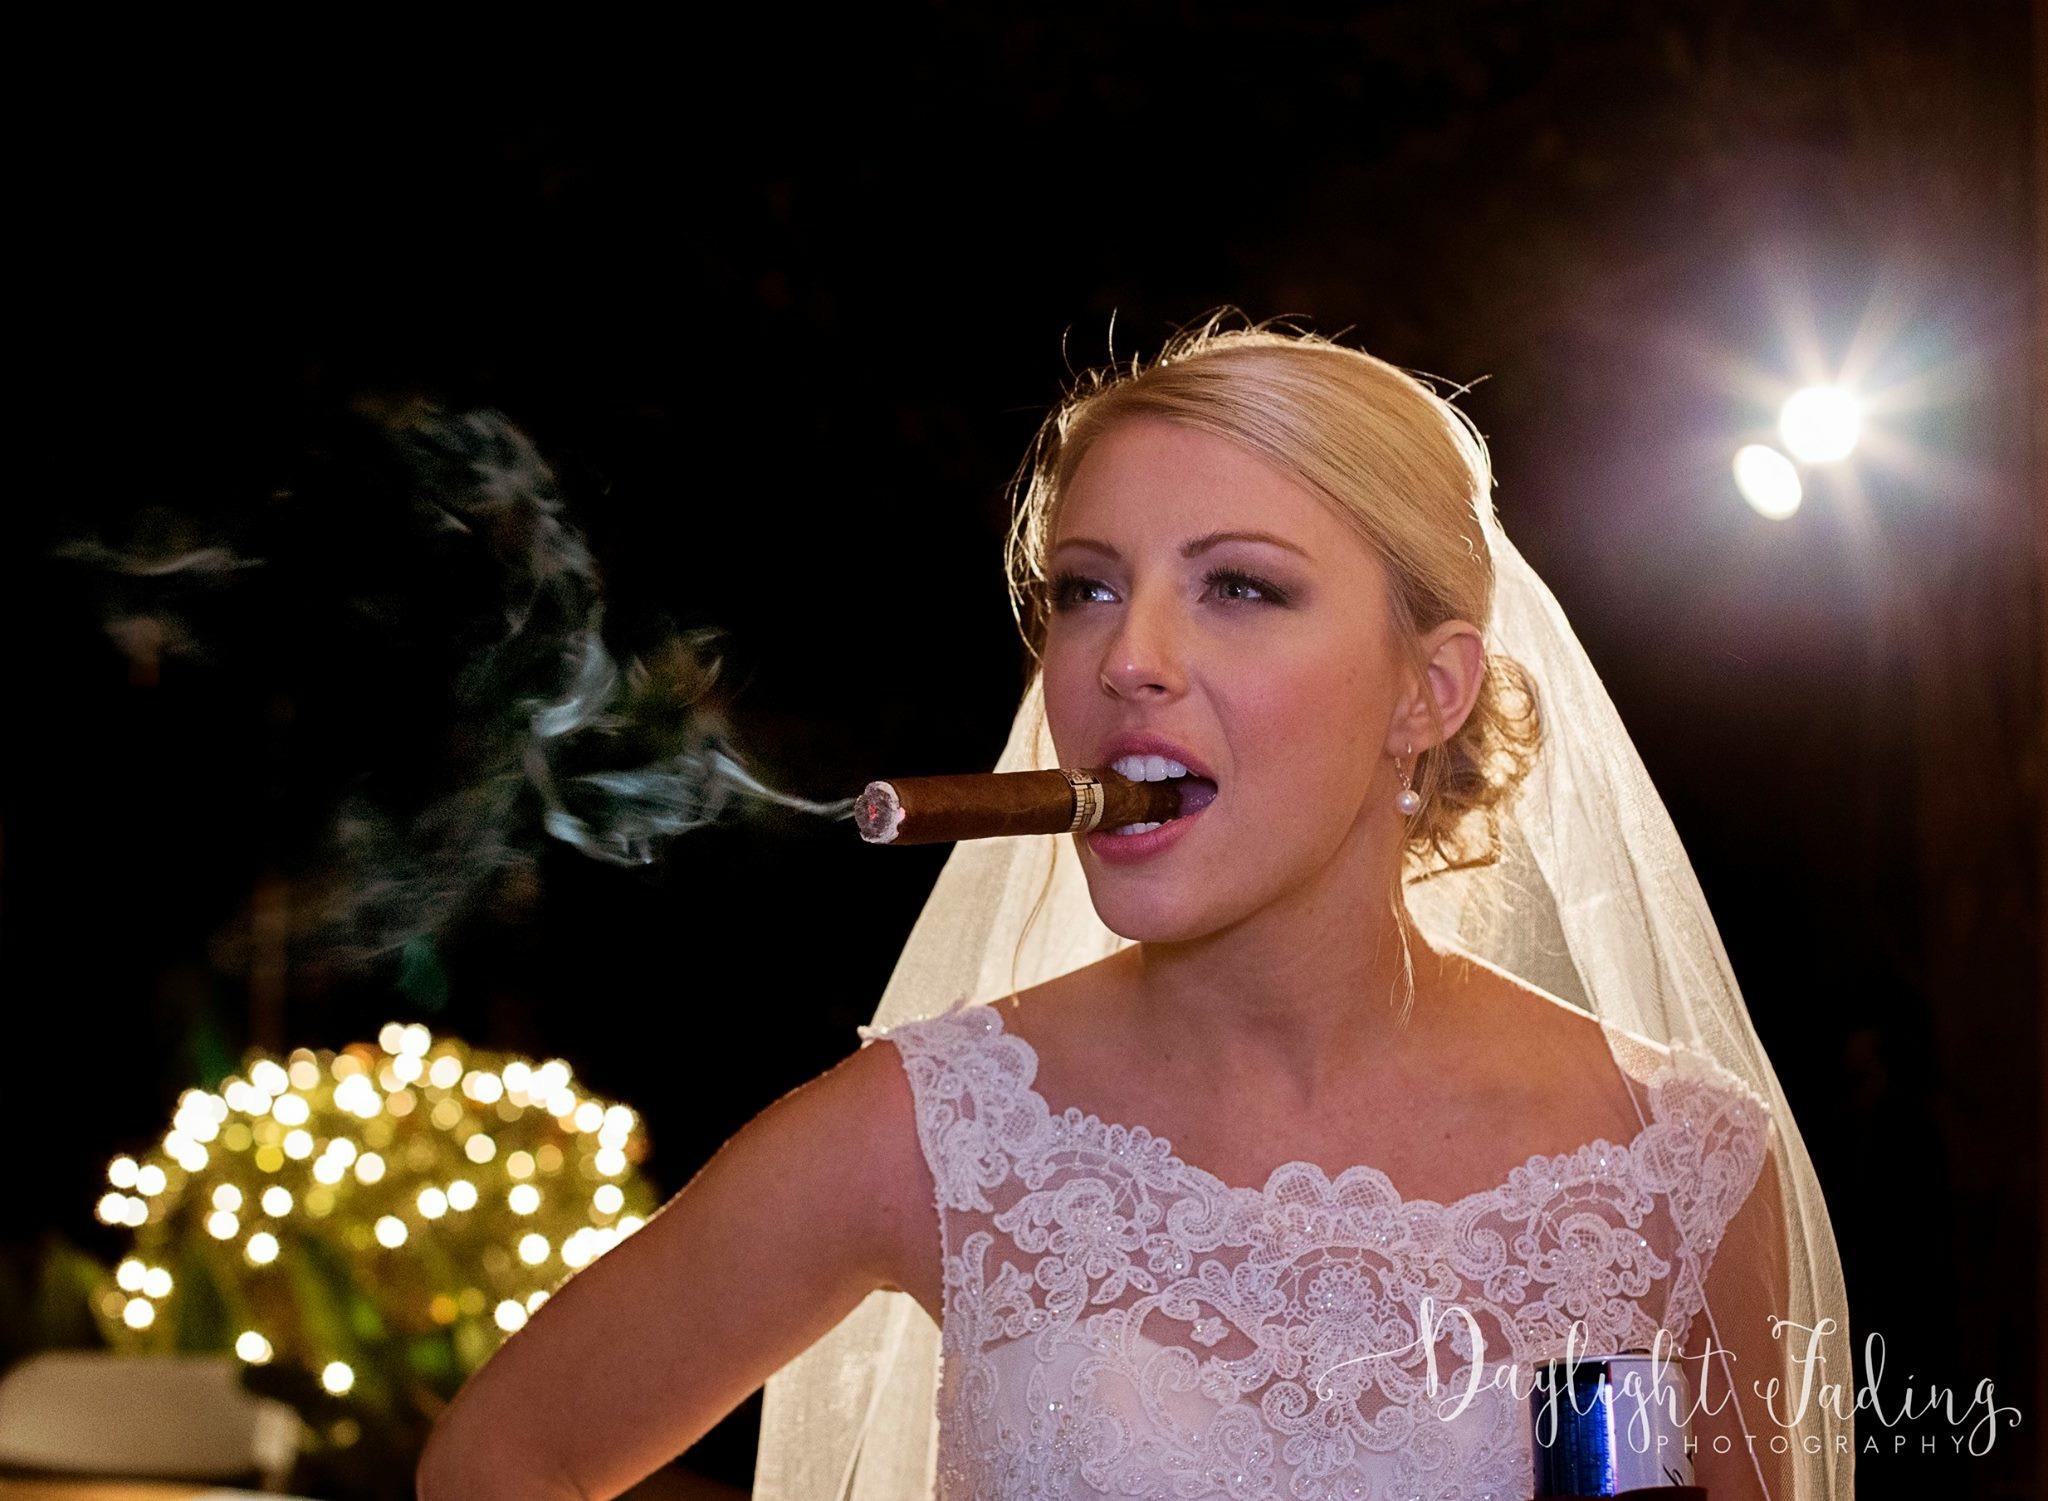 Fearless Bride at Creekwood Gardens, Louisiana - daylightfadingphotography.com